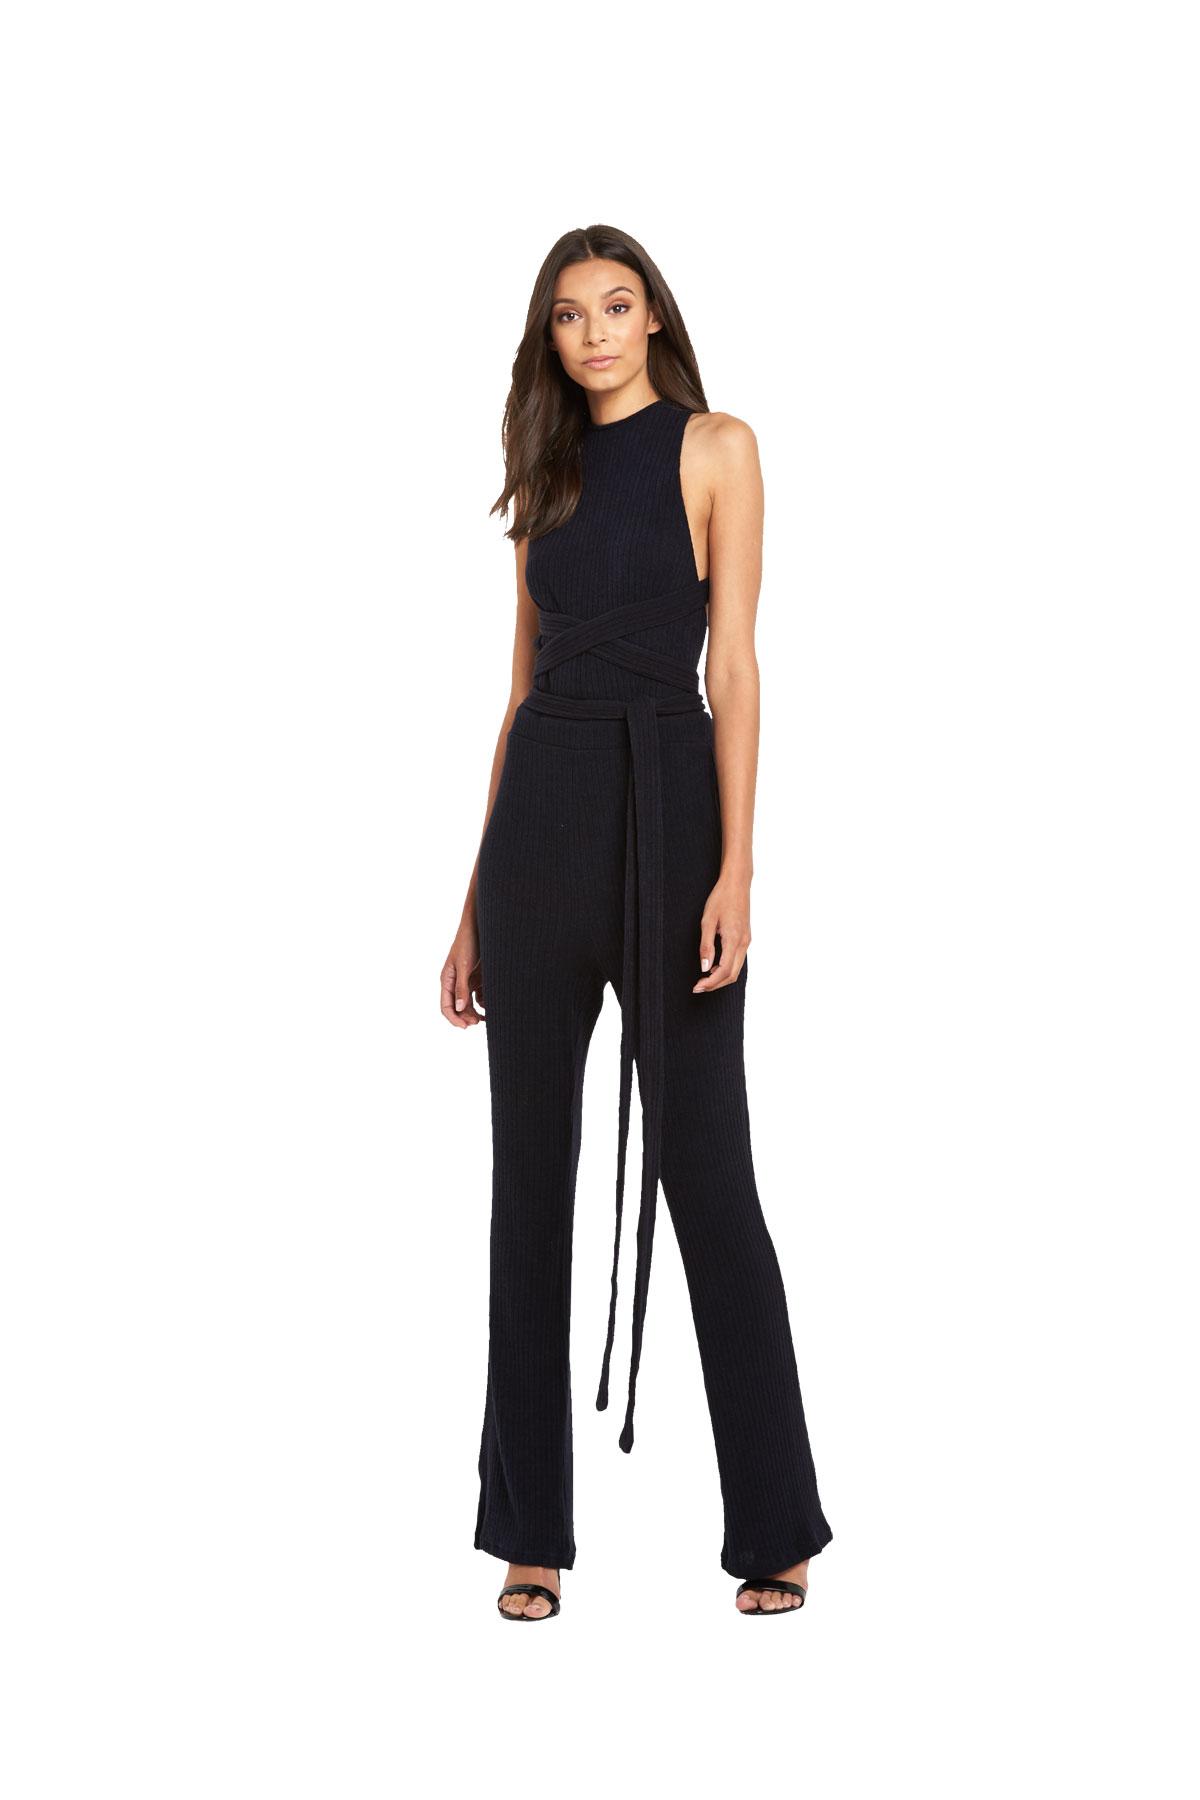 Lavish Alice Rib Knit Open Back Wrap Tie Flared Leg Jumpsuit